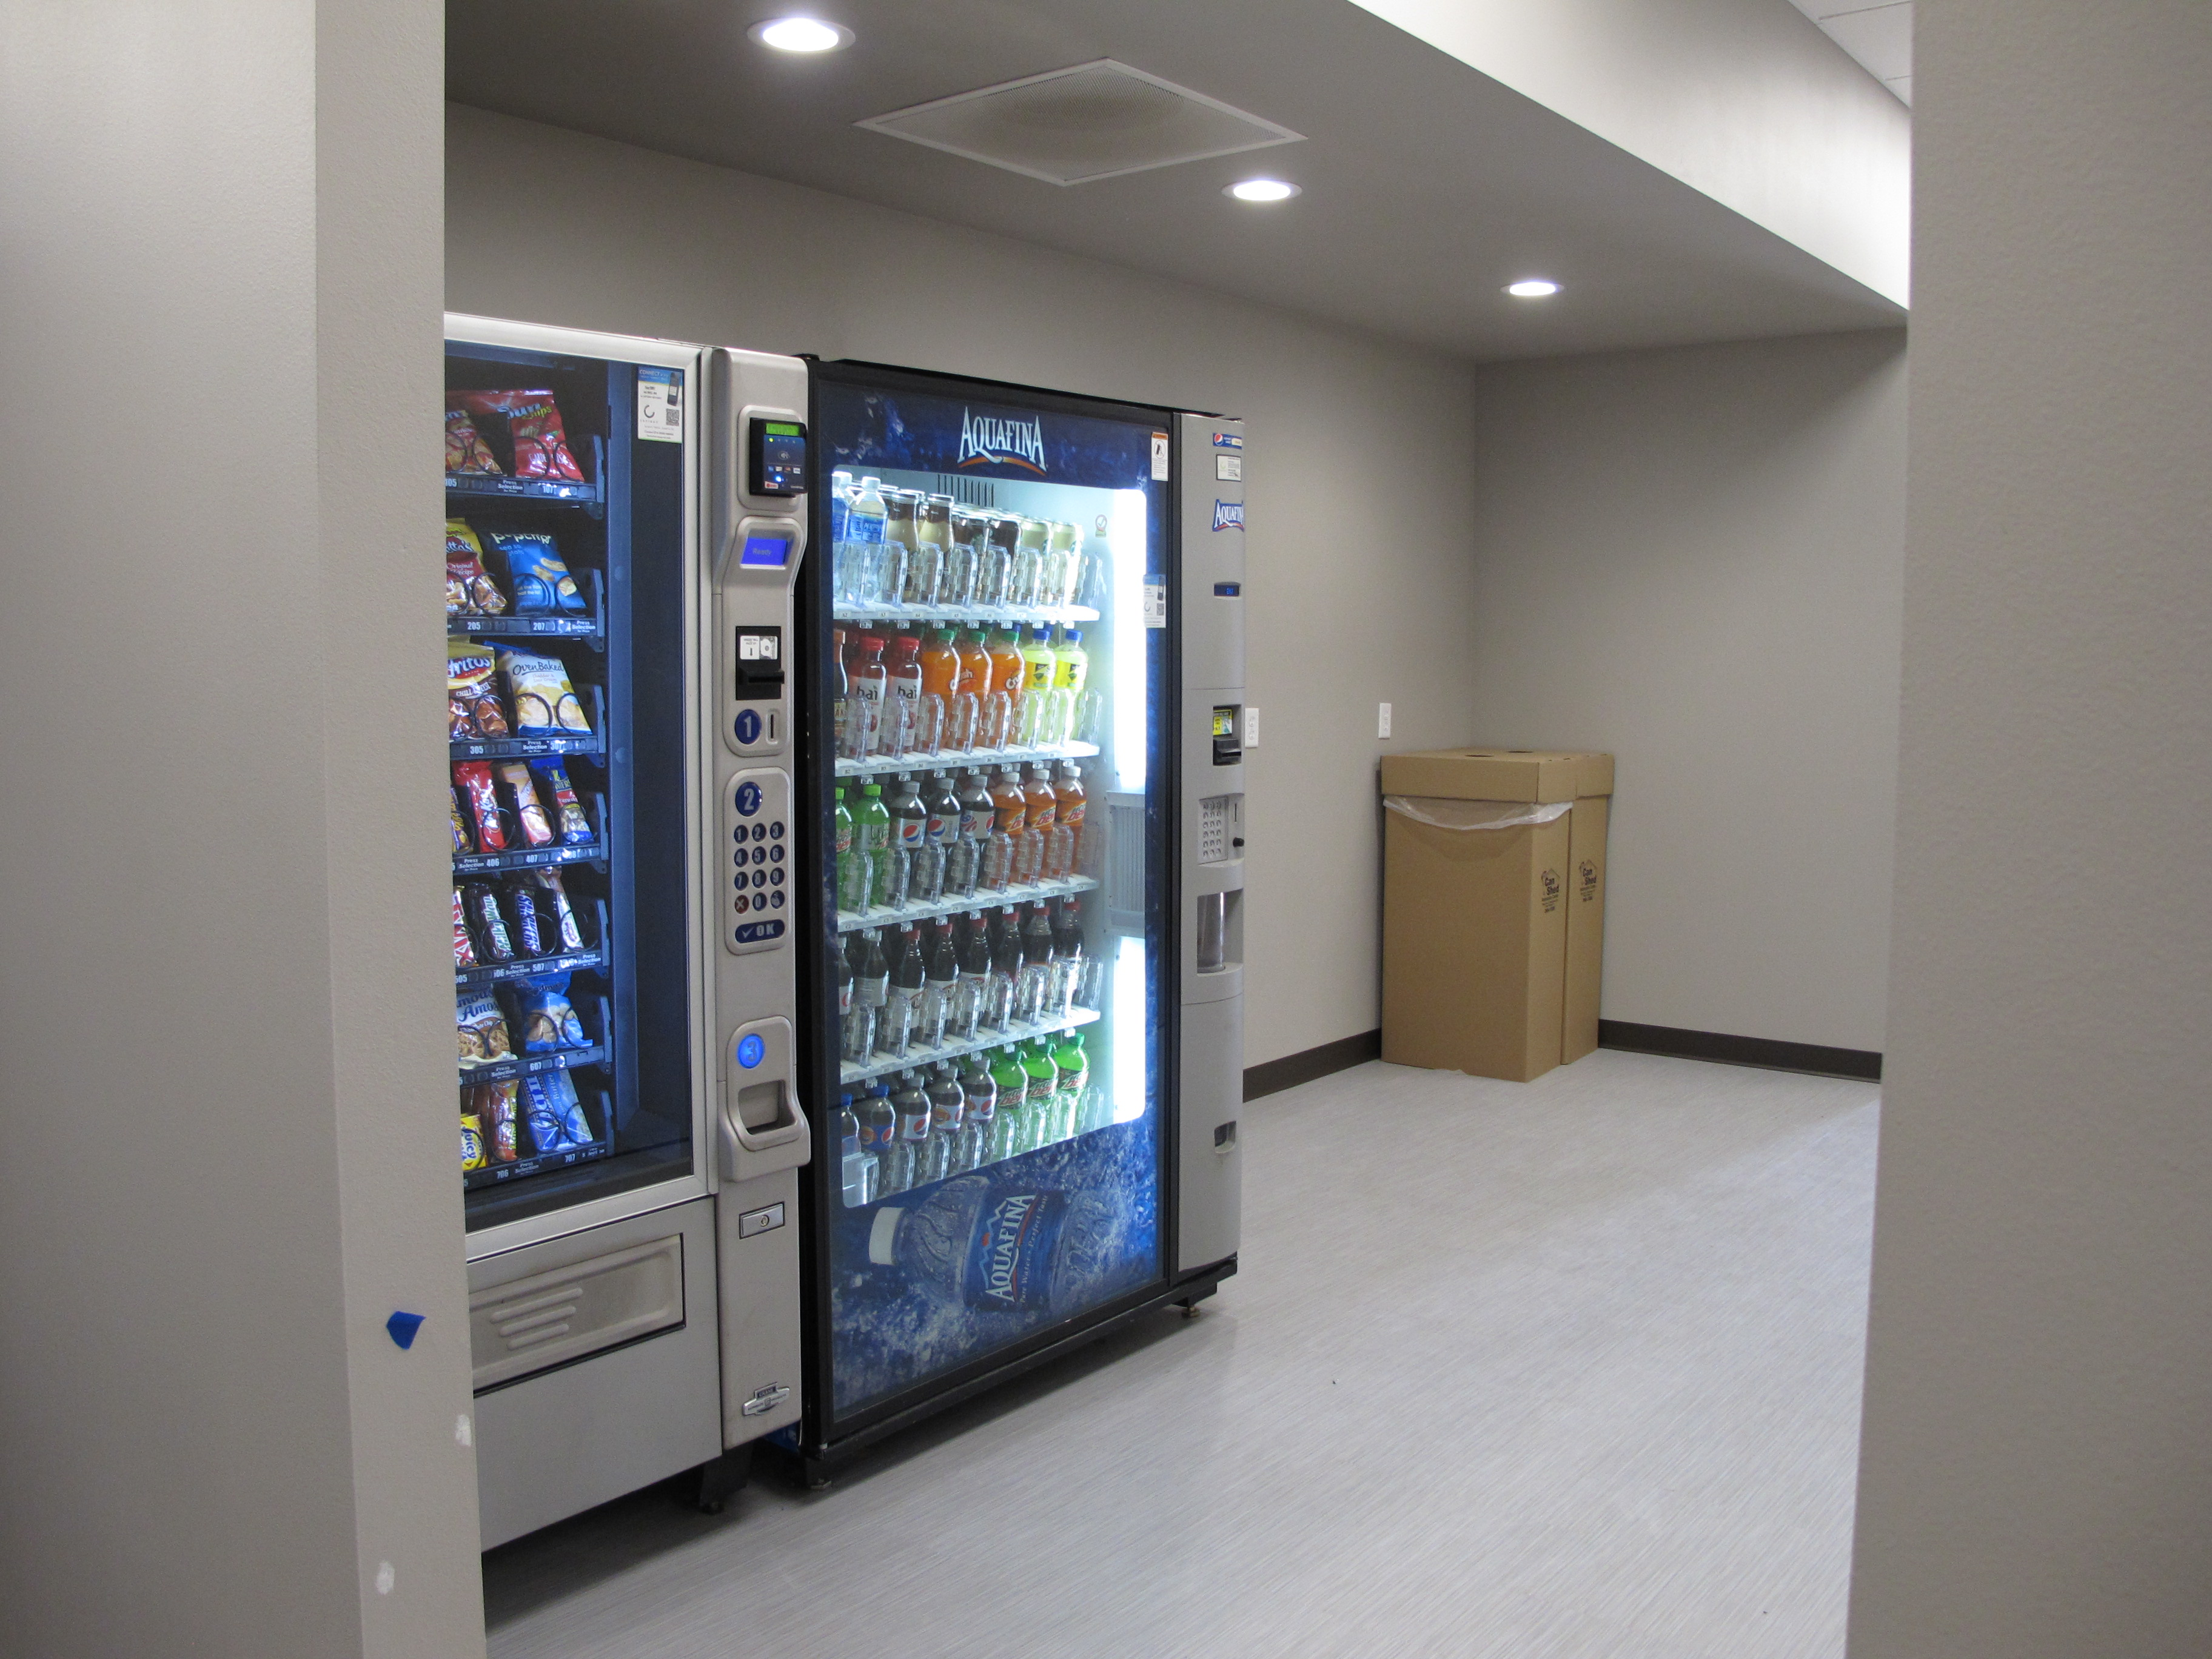 The new vending machines are pretty popular.